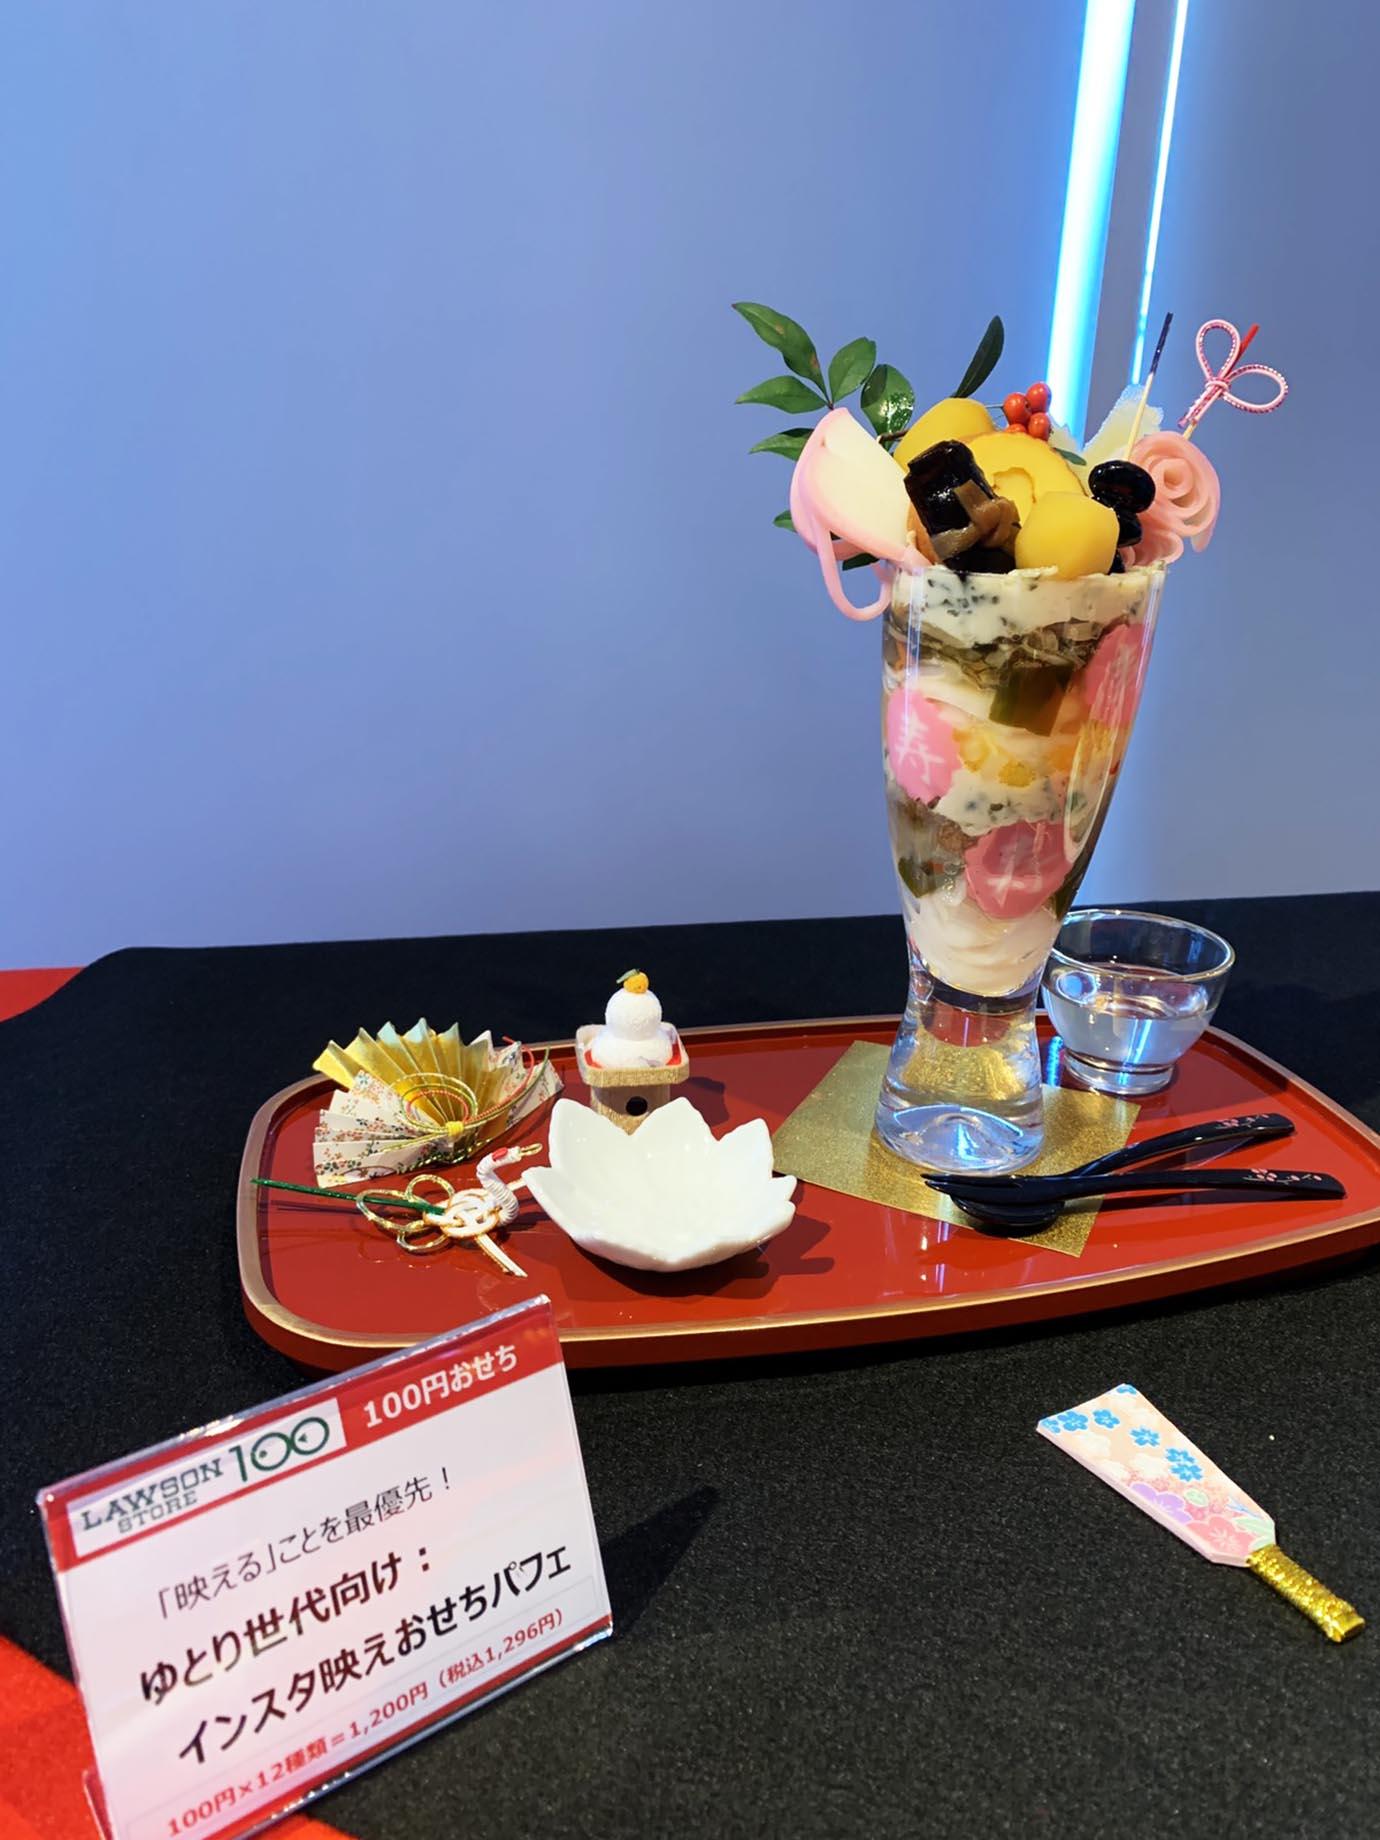 store100-lawson-osechi-food4